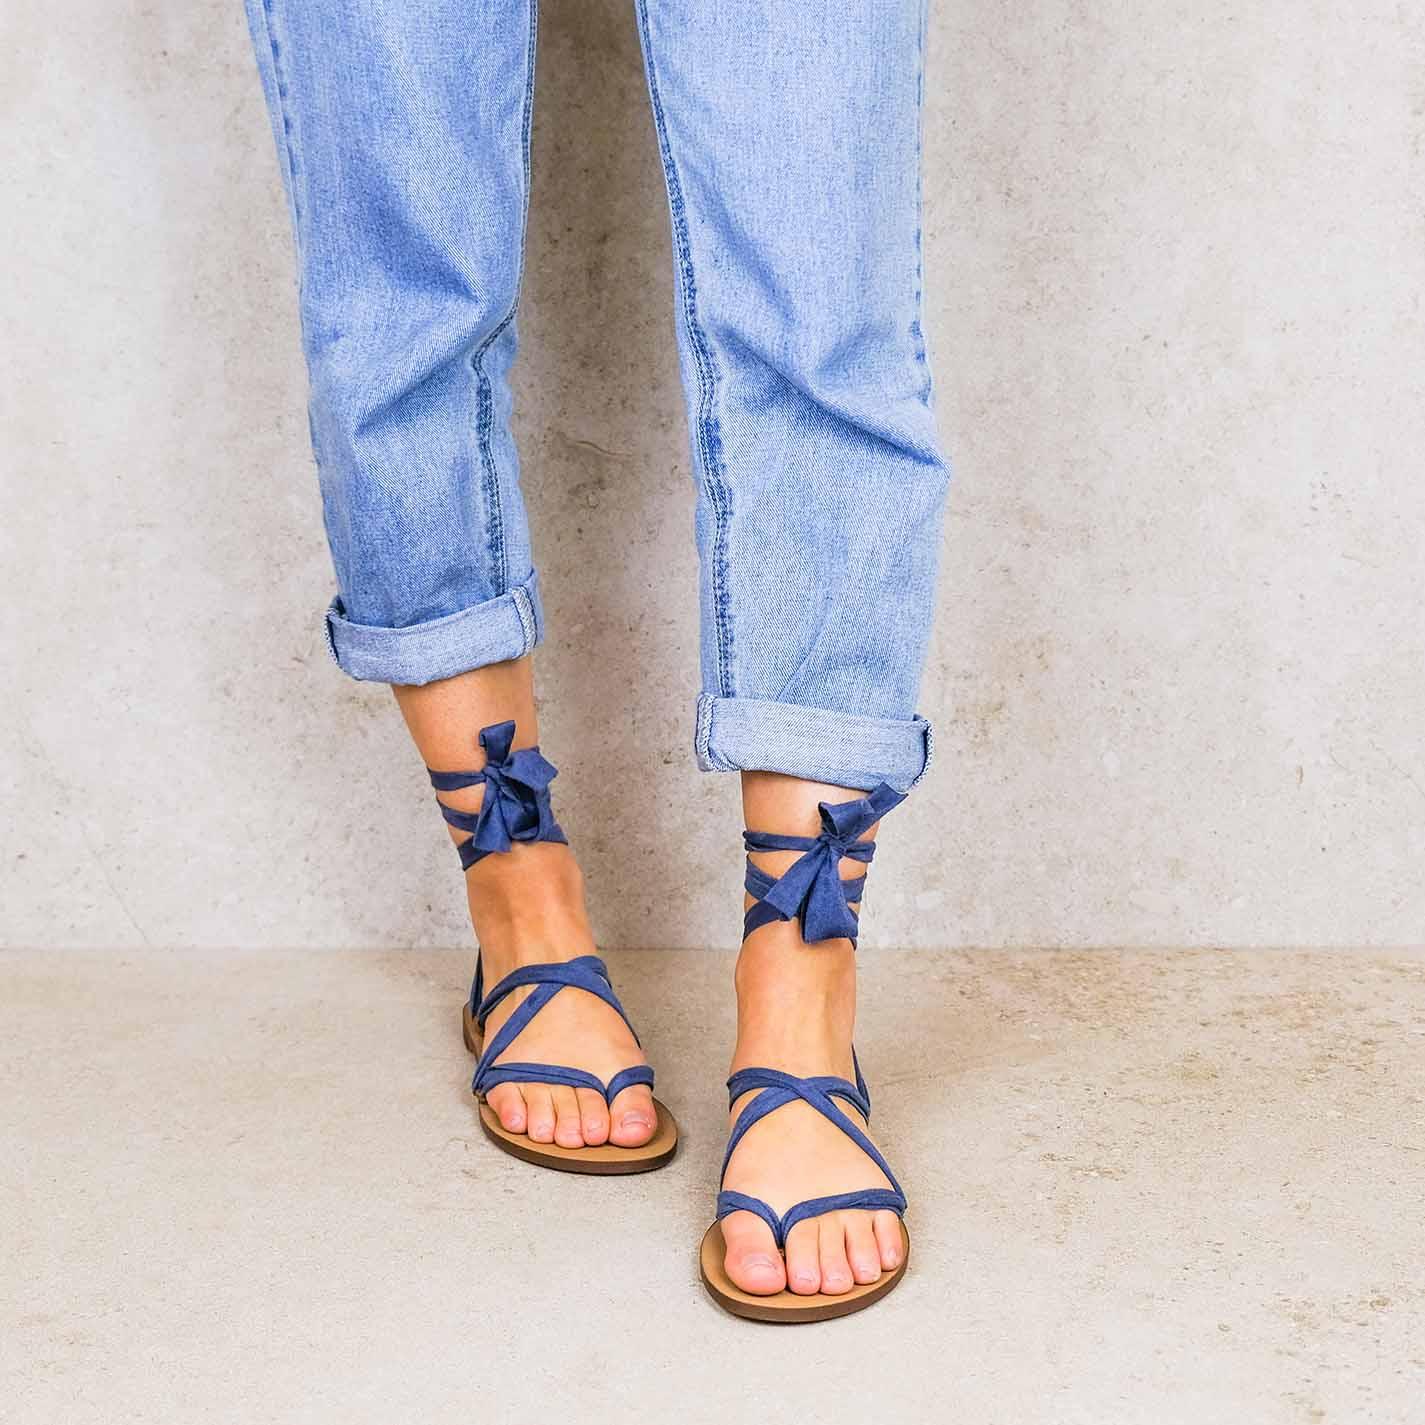 Navy-blue_suede ribbons linten lintsandalen sandals travelsandals vegan sustainable sandals wikkelsandalen